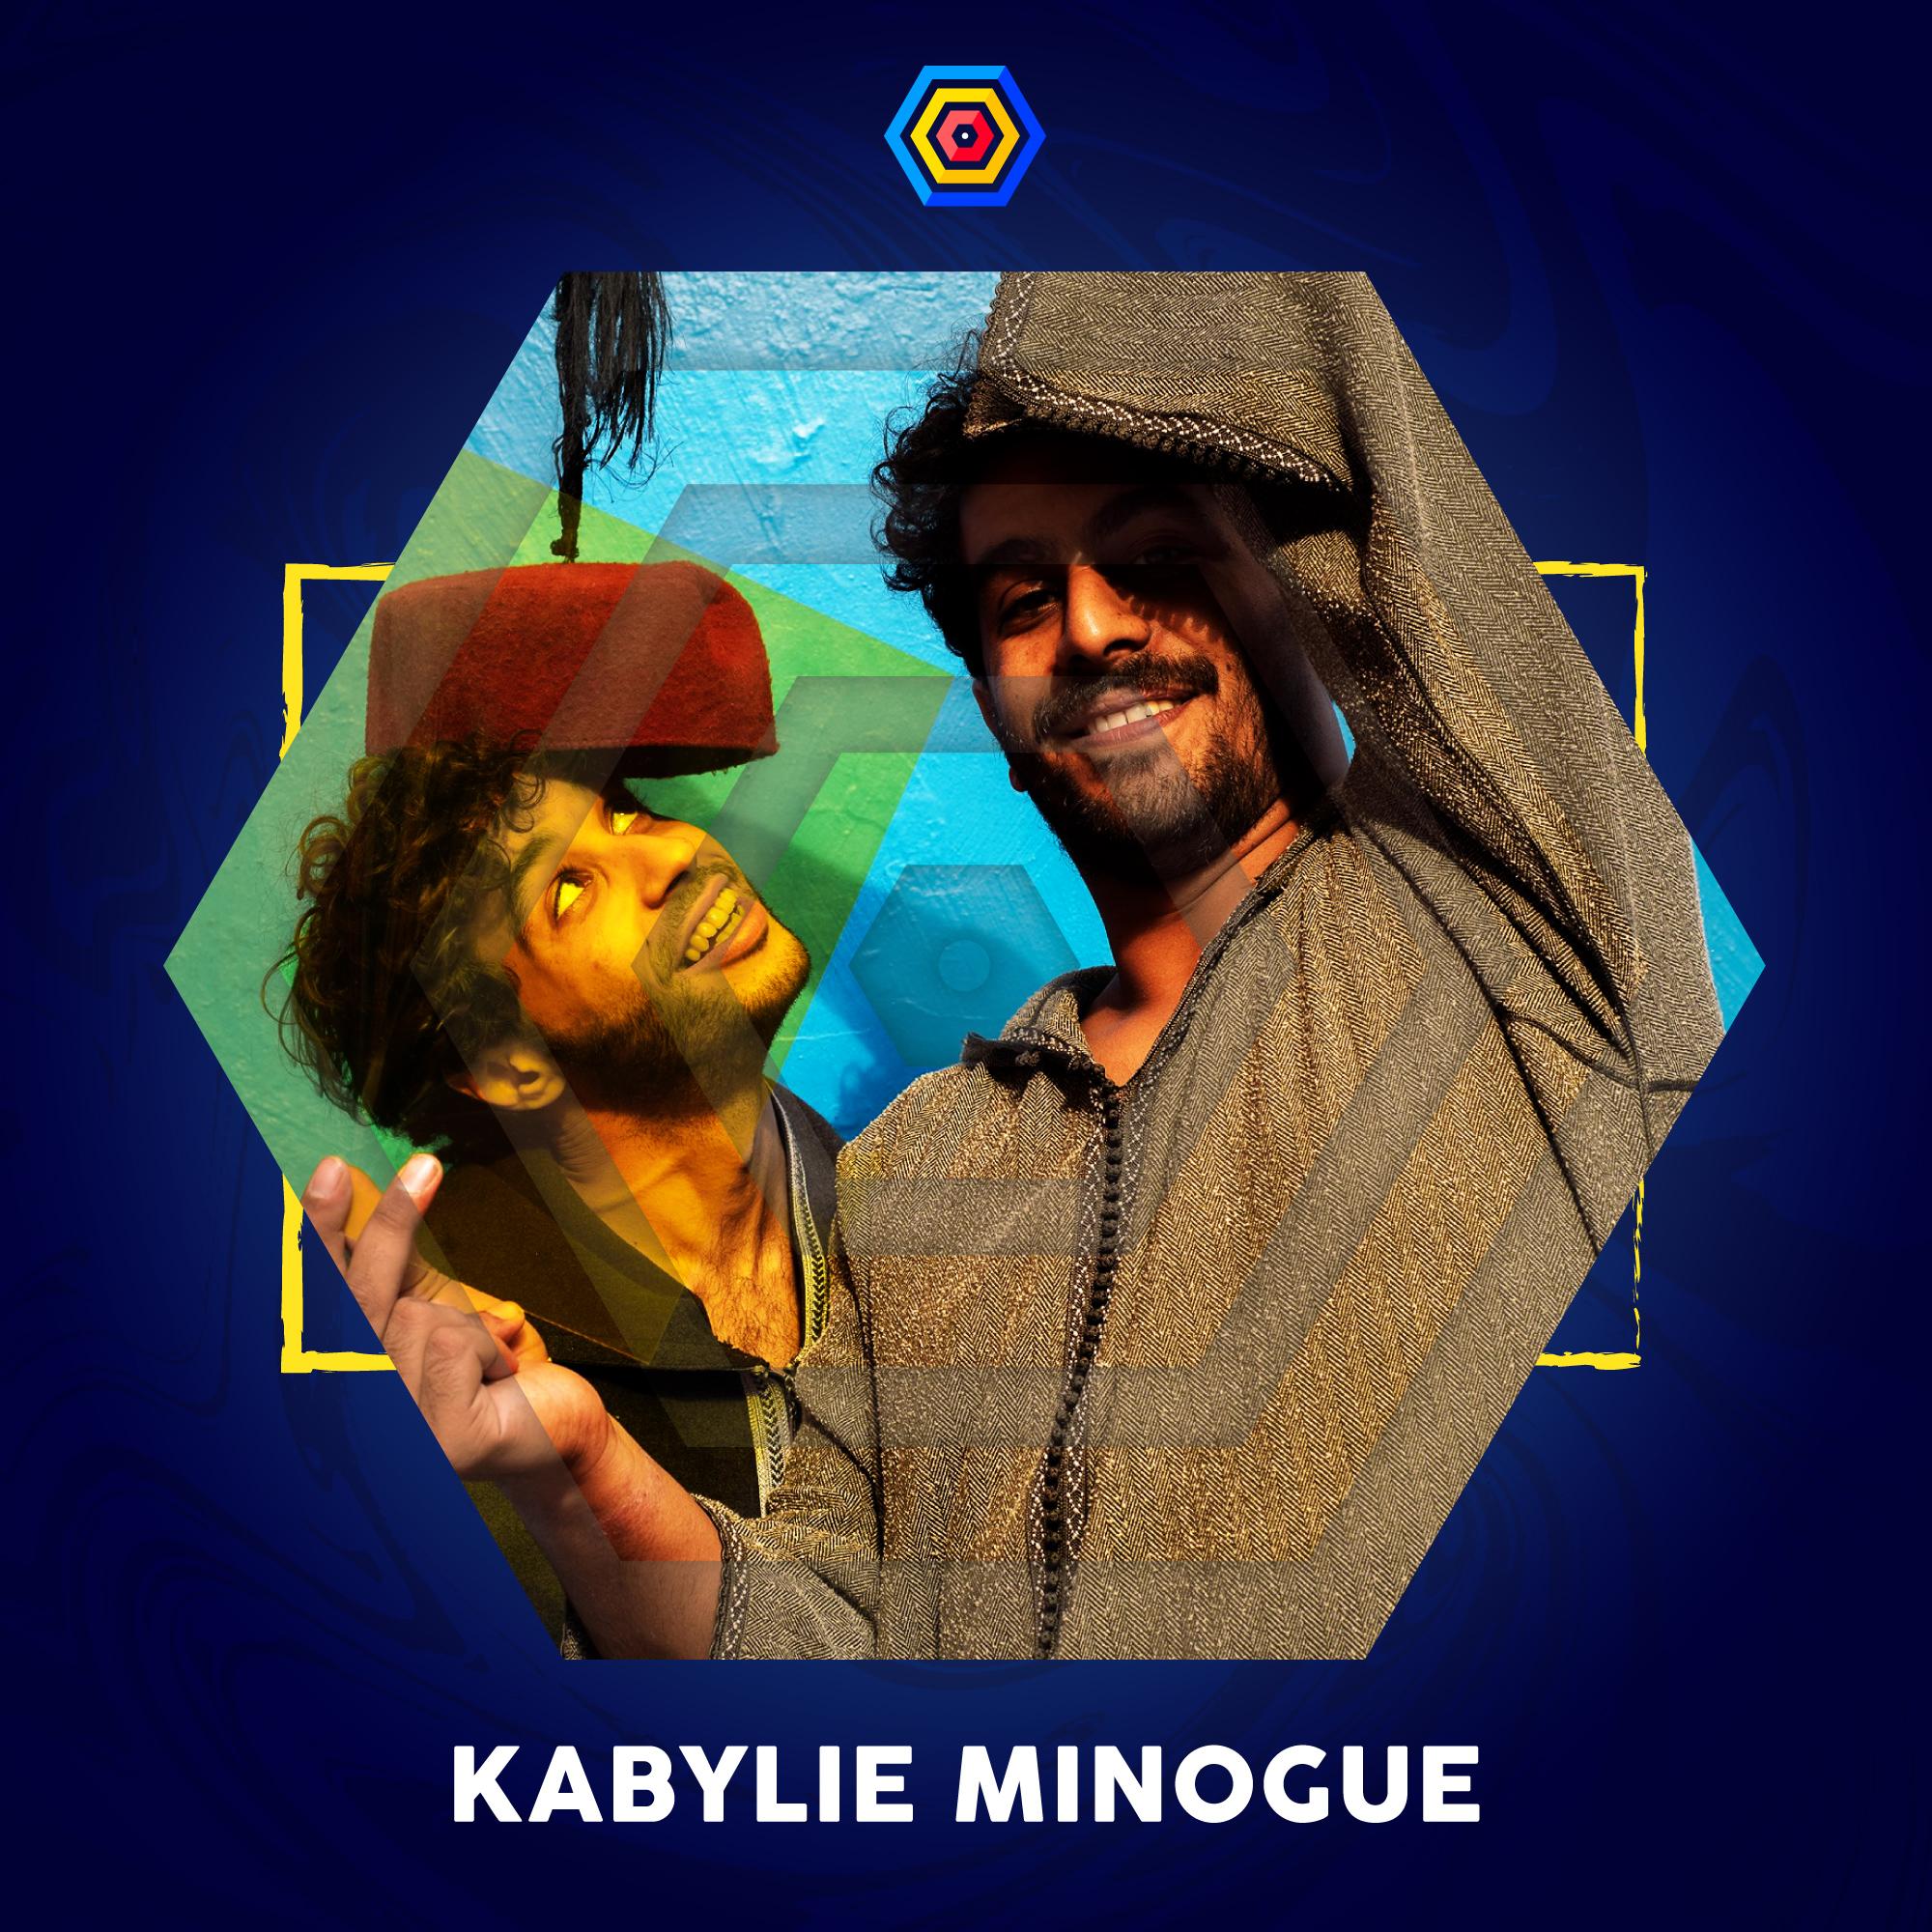 Kabylie-Minogue